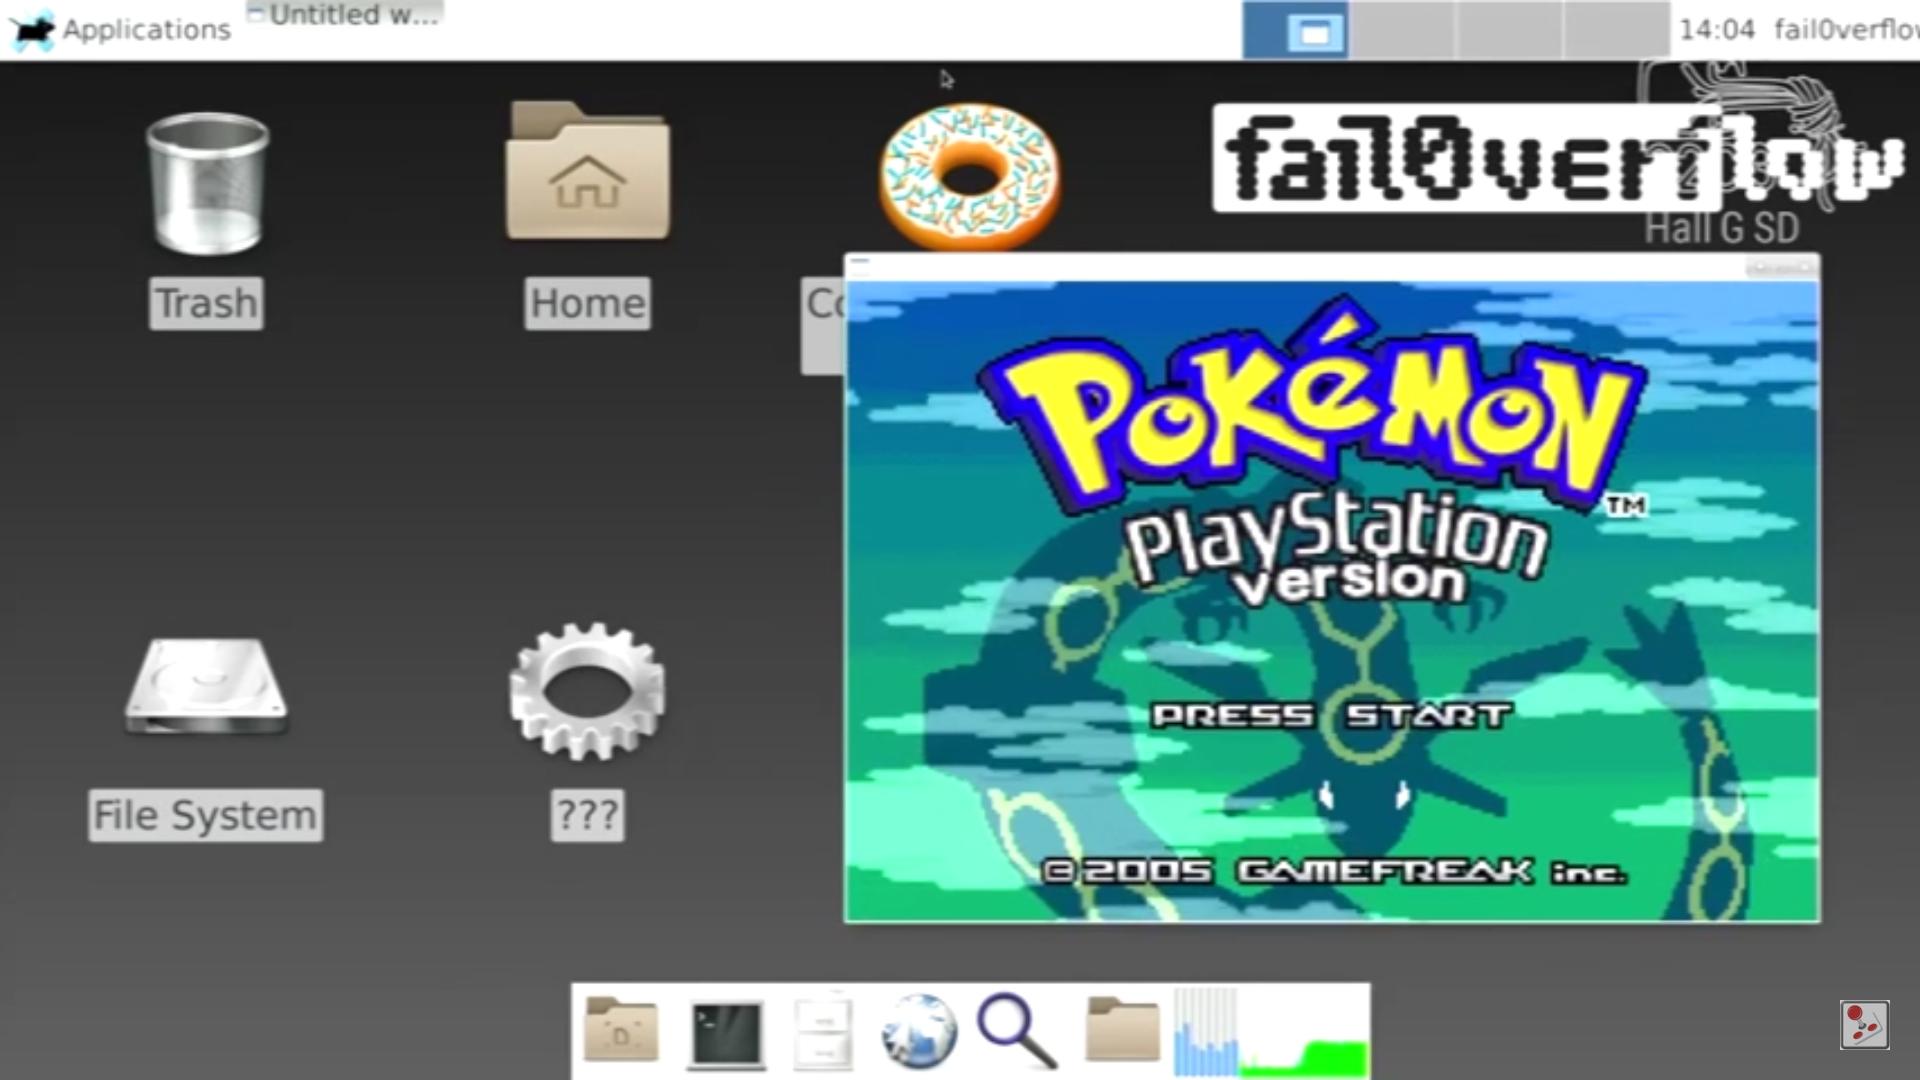 FailOverflow PlayStation 4 Linux hack